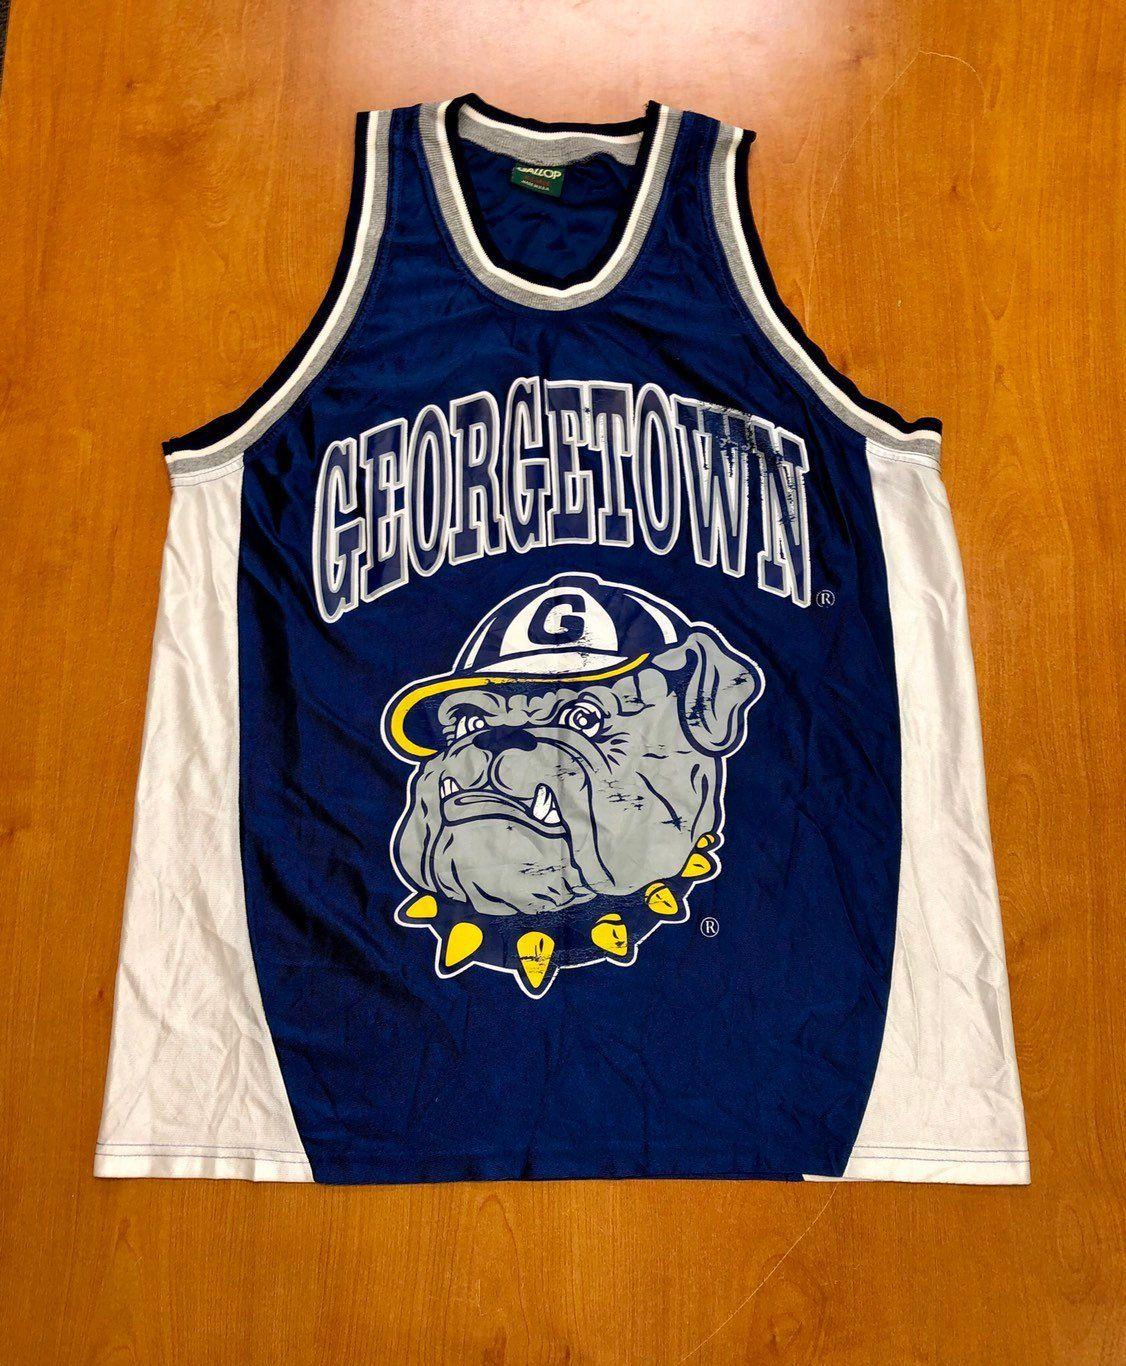 the best attitude dc201 1103e Vintage 1994 - 1996 Allen Iverson Georgetown Hoyas Jersey ...